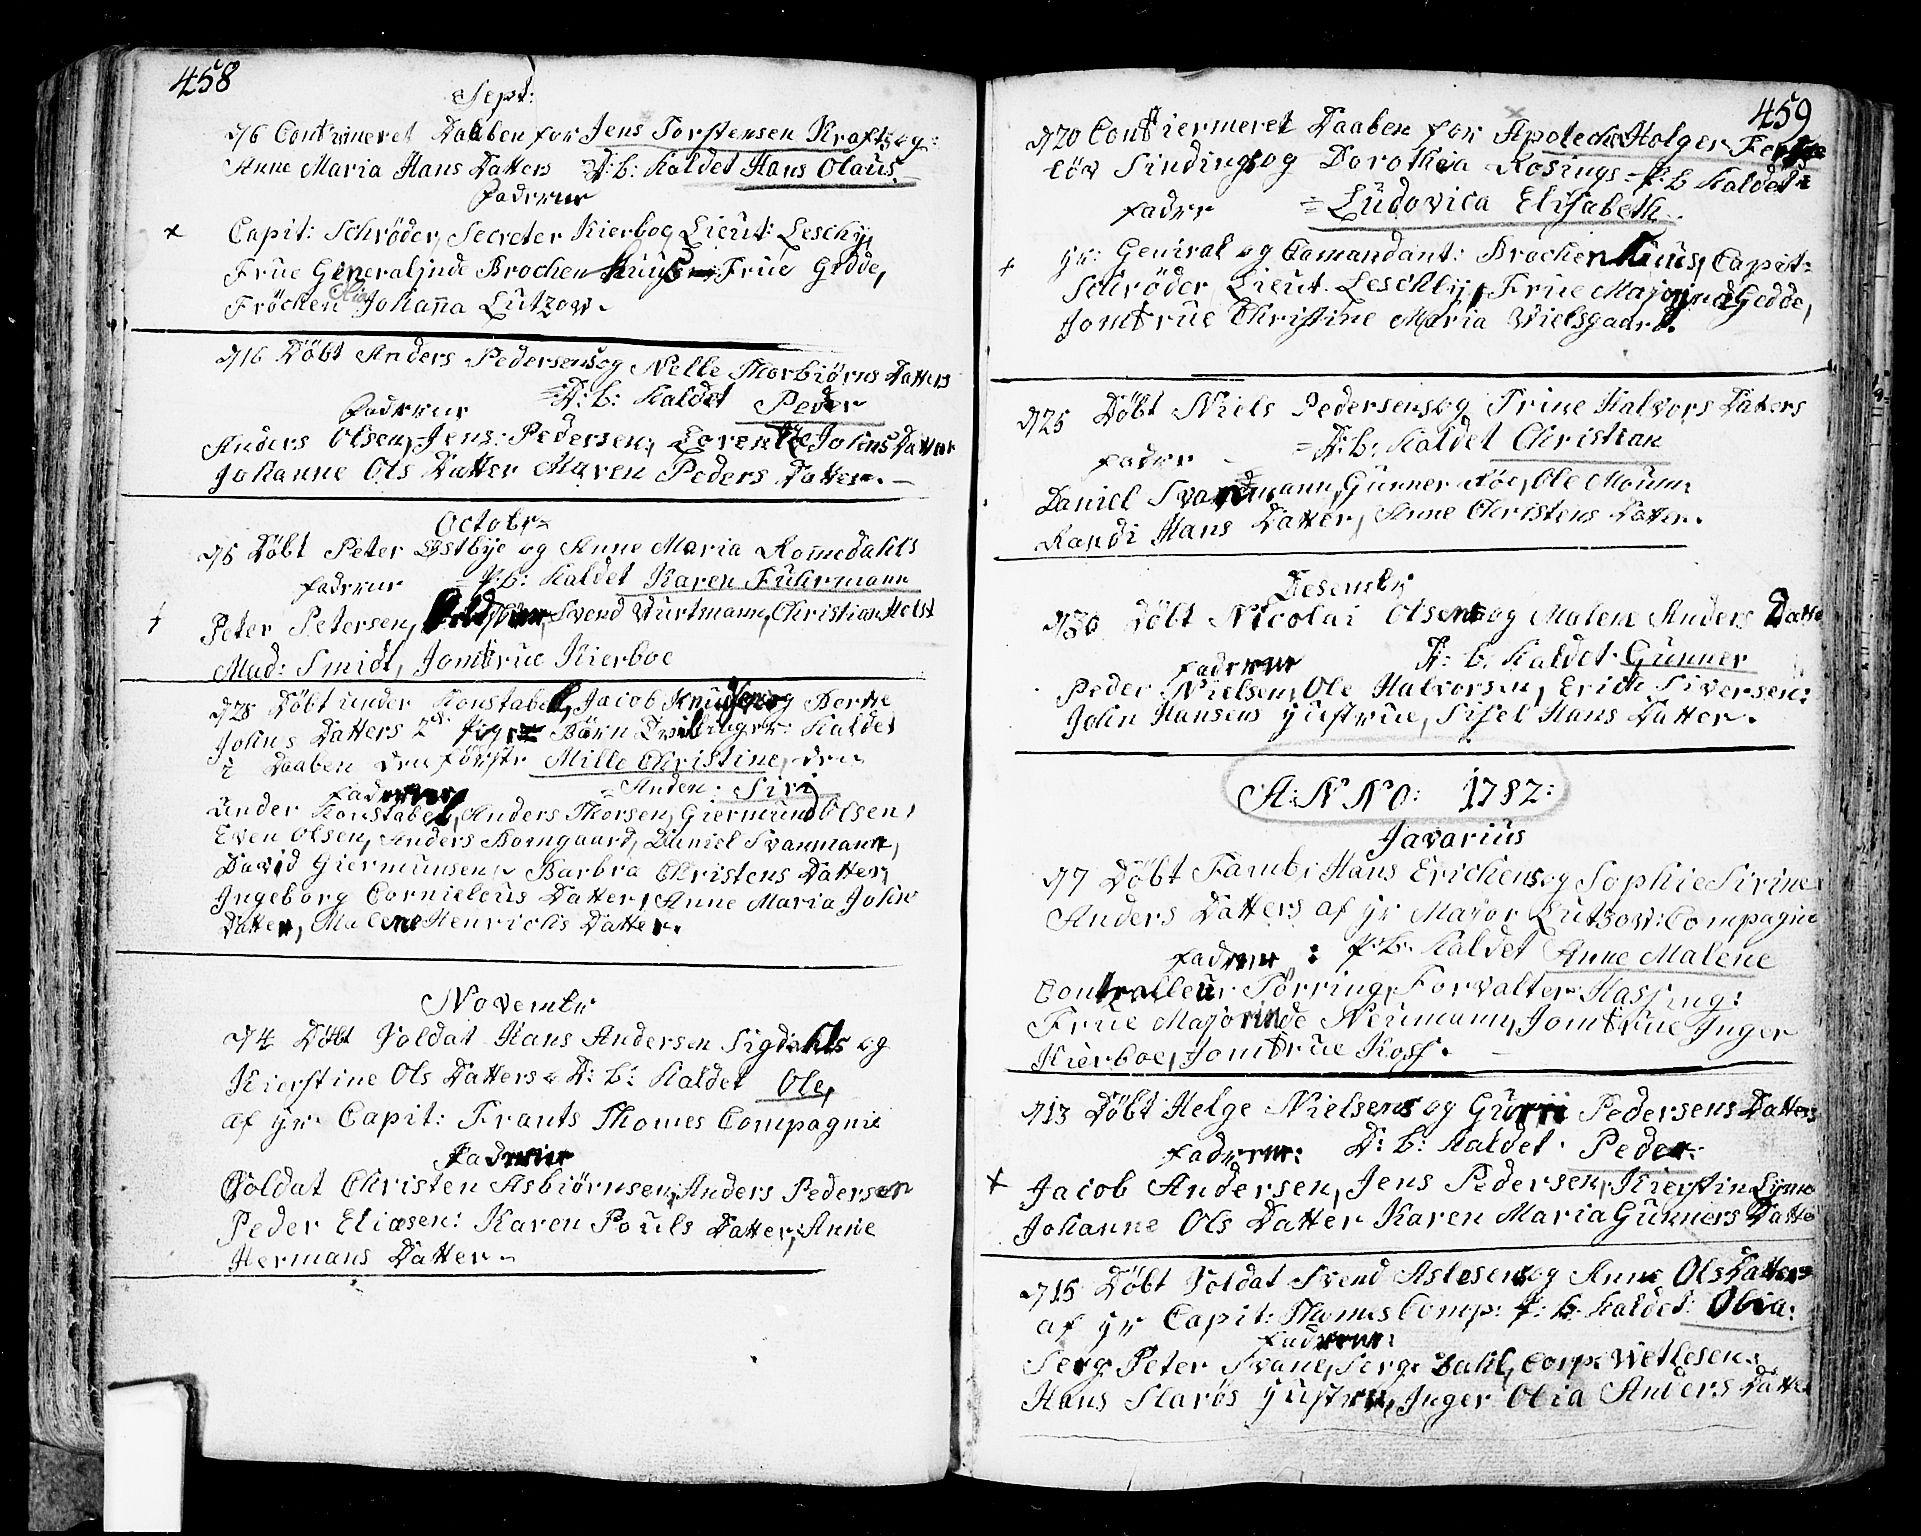 SAO, Fredrikstad prestekontor Kirkebøker, F/Fa/L0002: Ministerialbok nr. 2, 1750-1804, s. 458-459